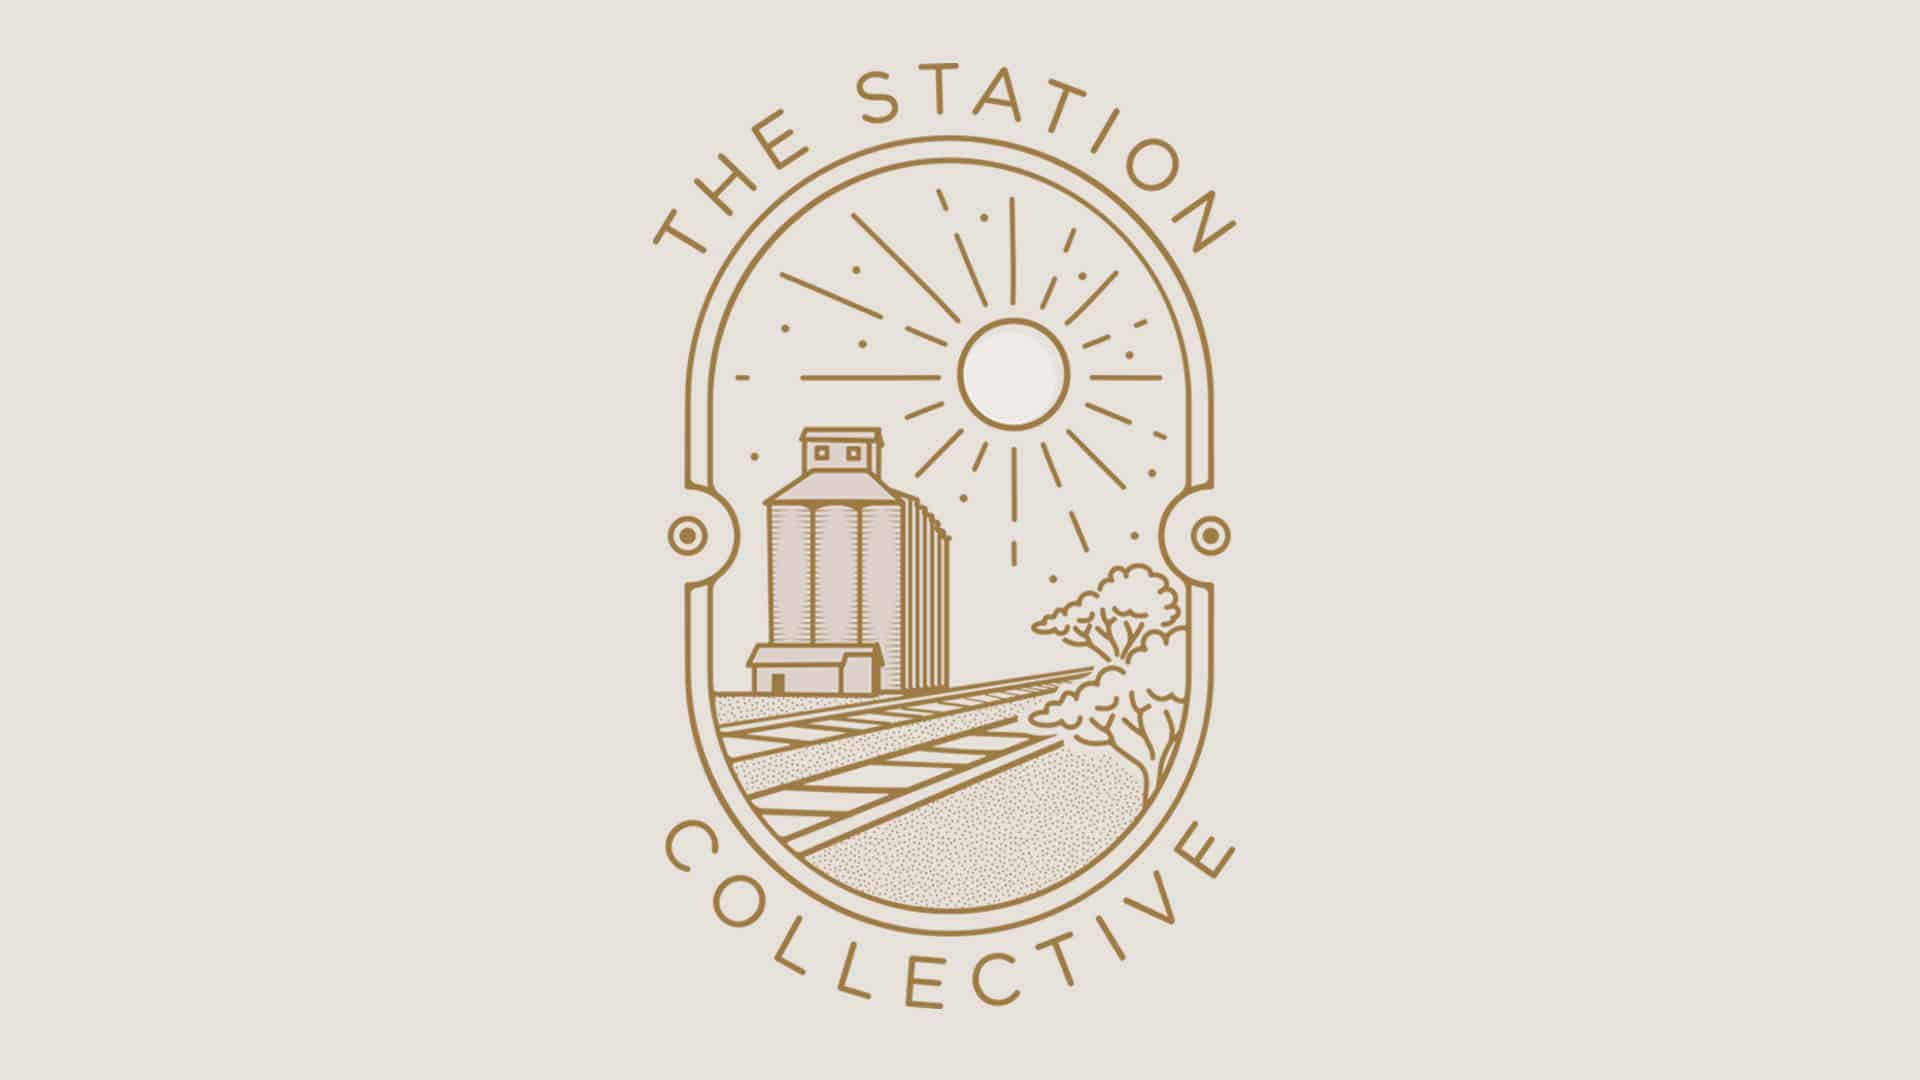 the station logo design